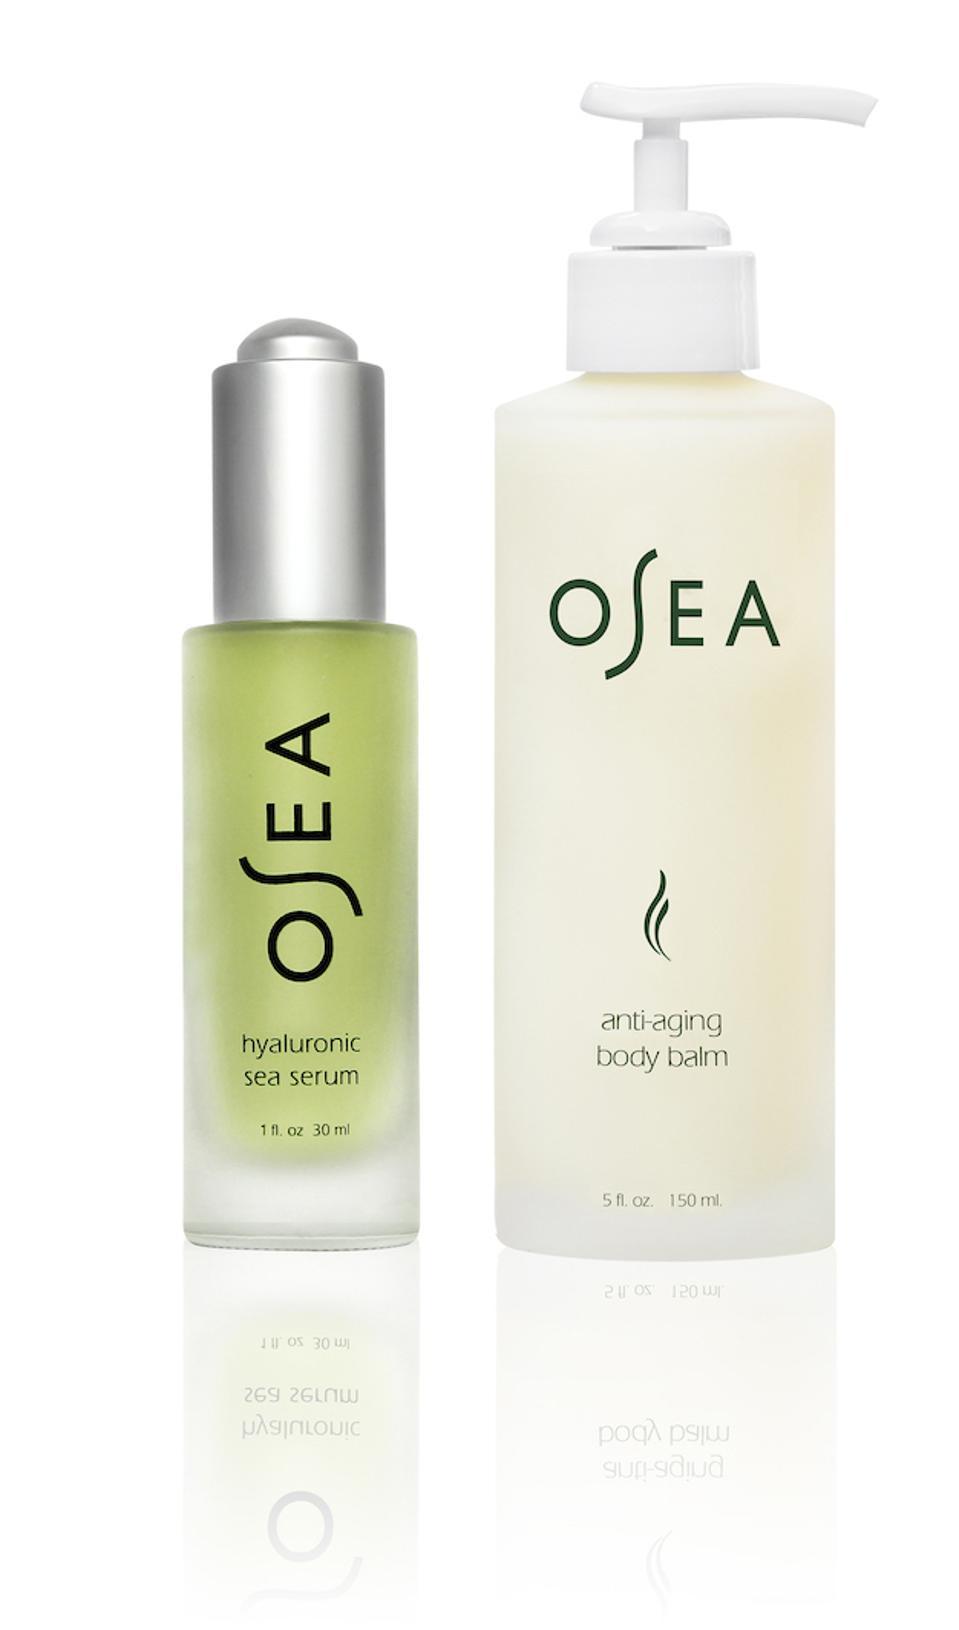 OSEA Hylauronic sea serum and anti-aging body balm.